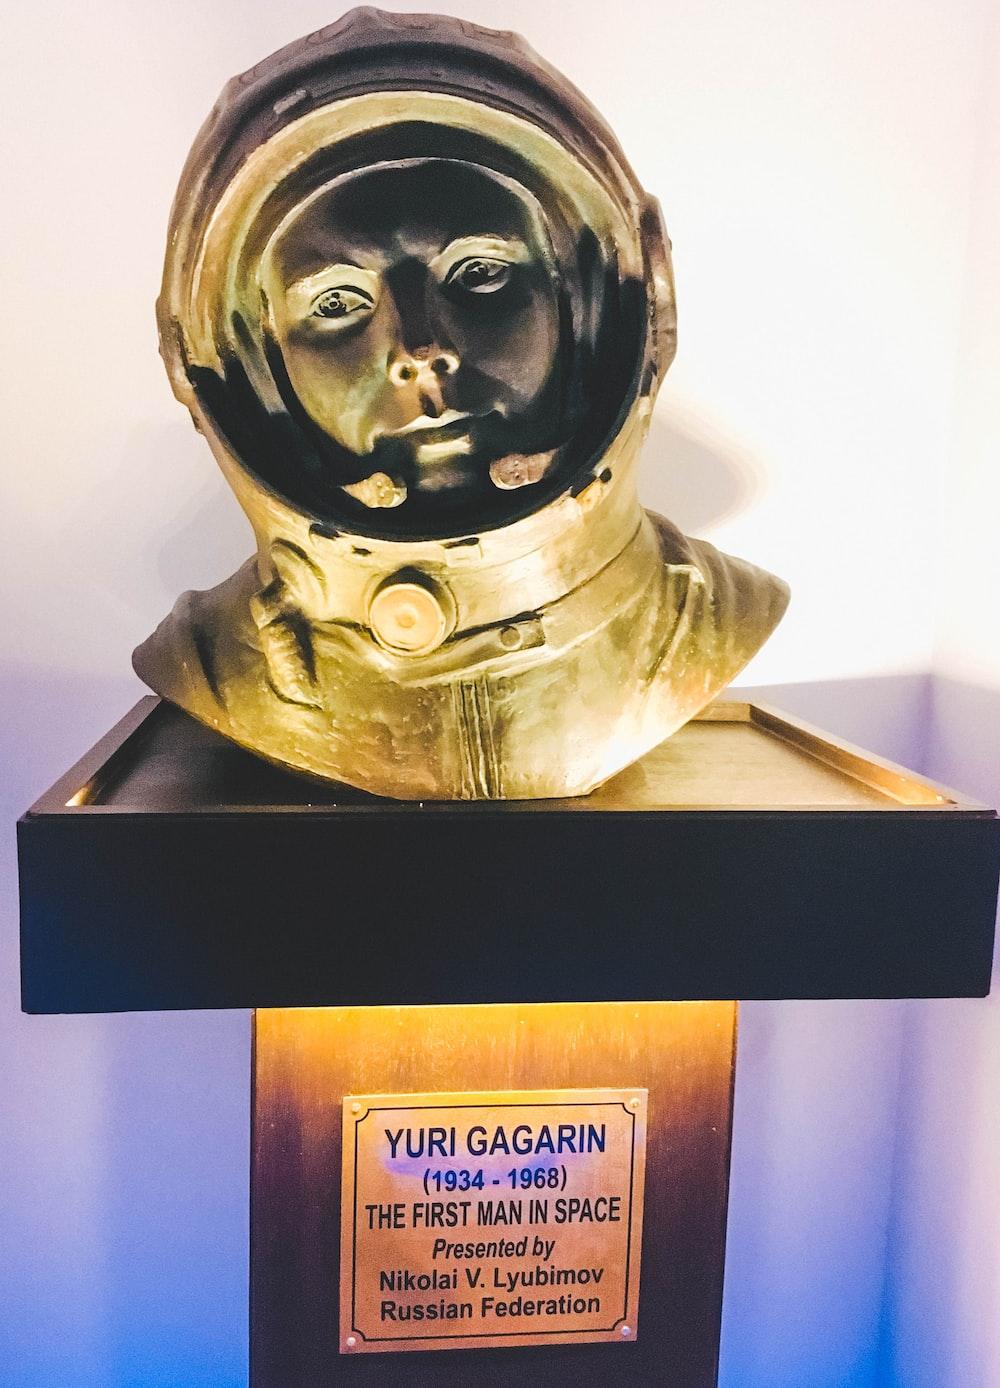 gold human head bust on white wooden shelf